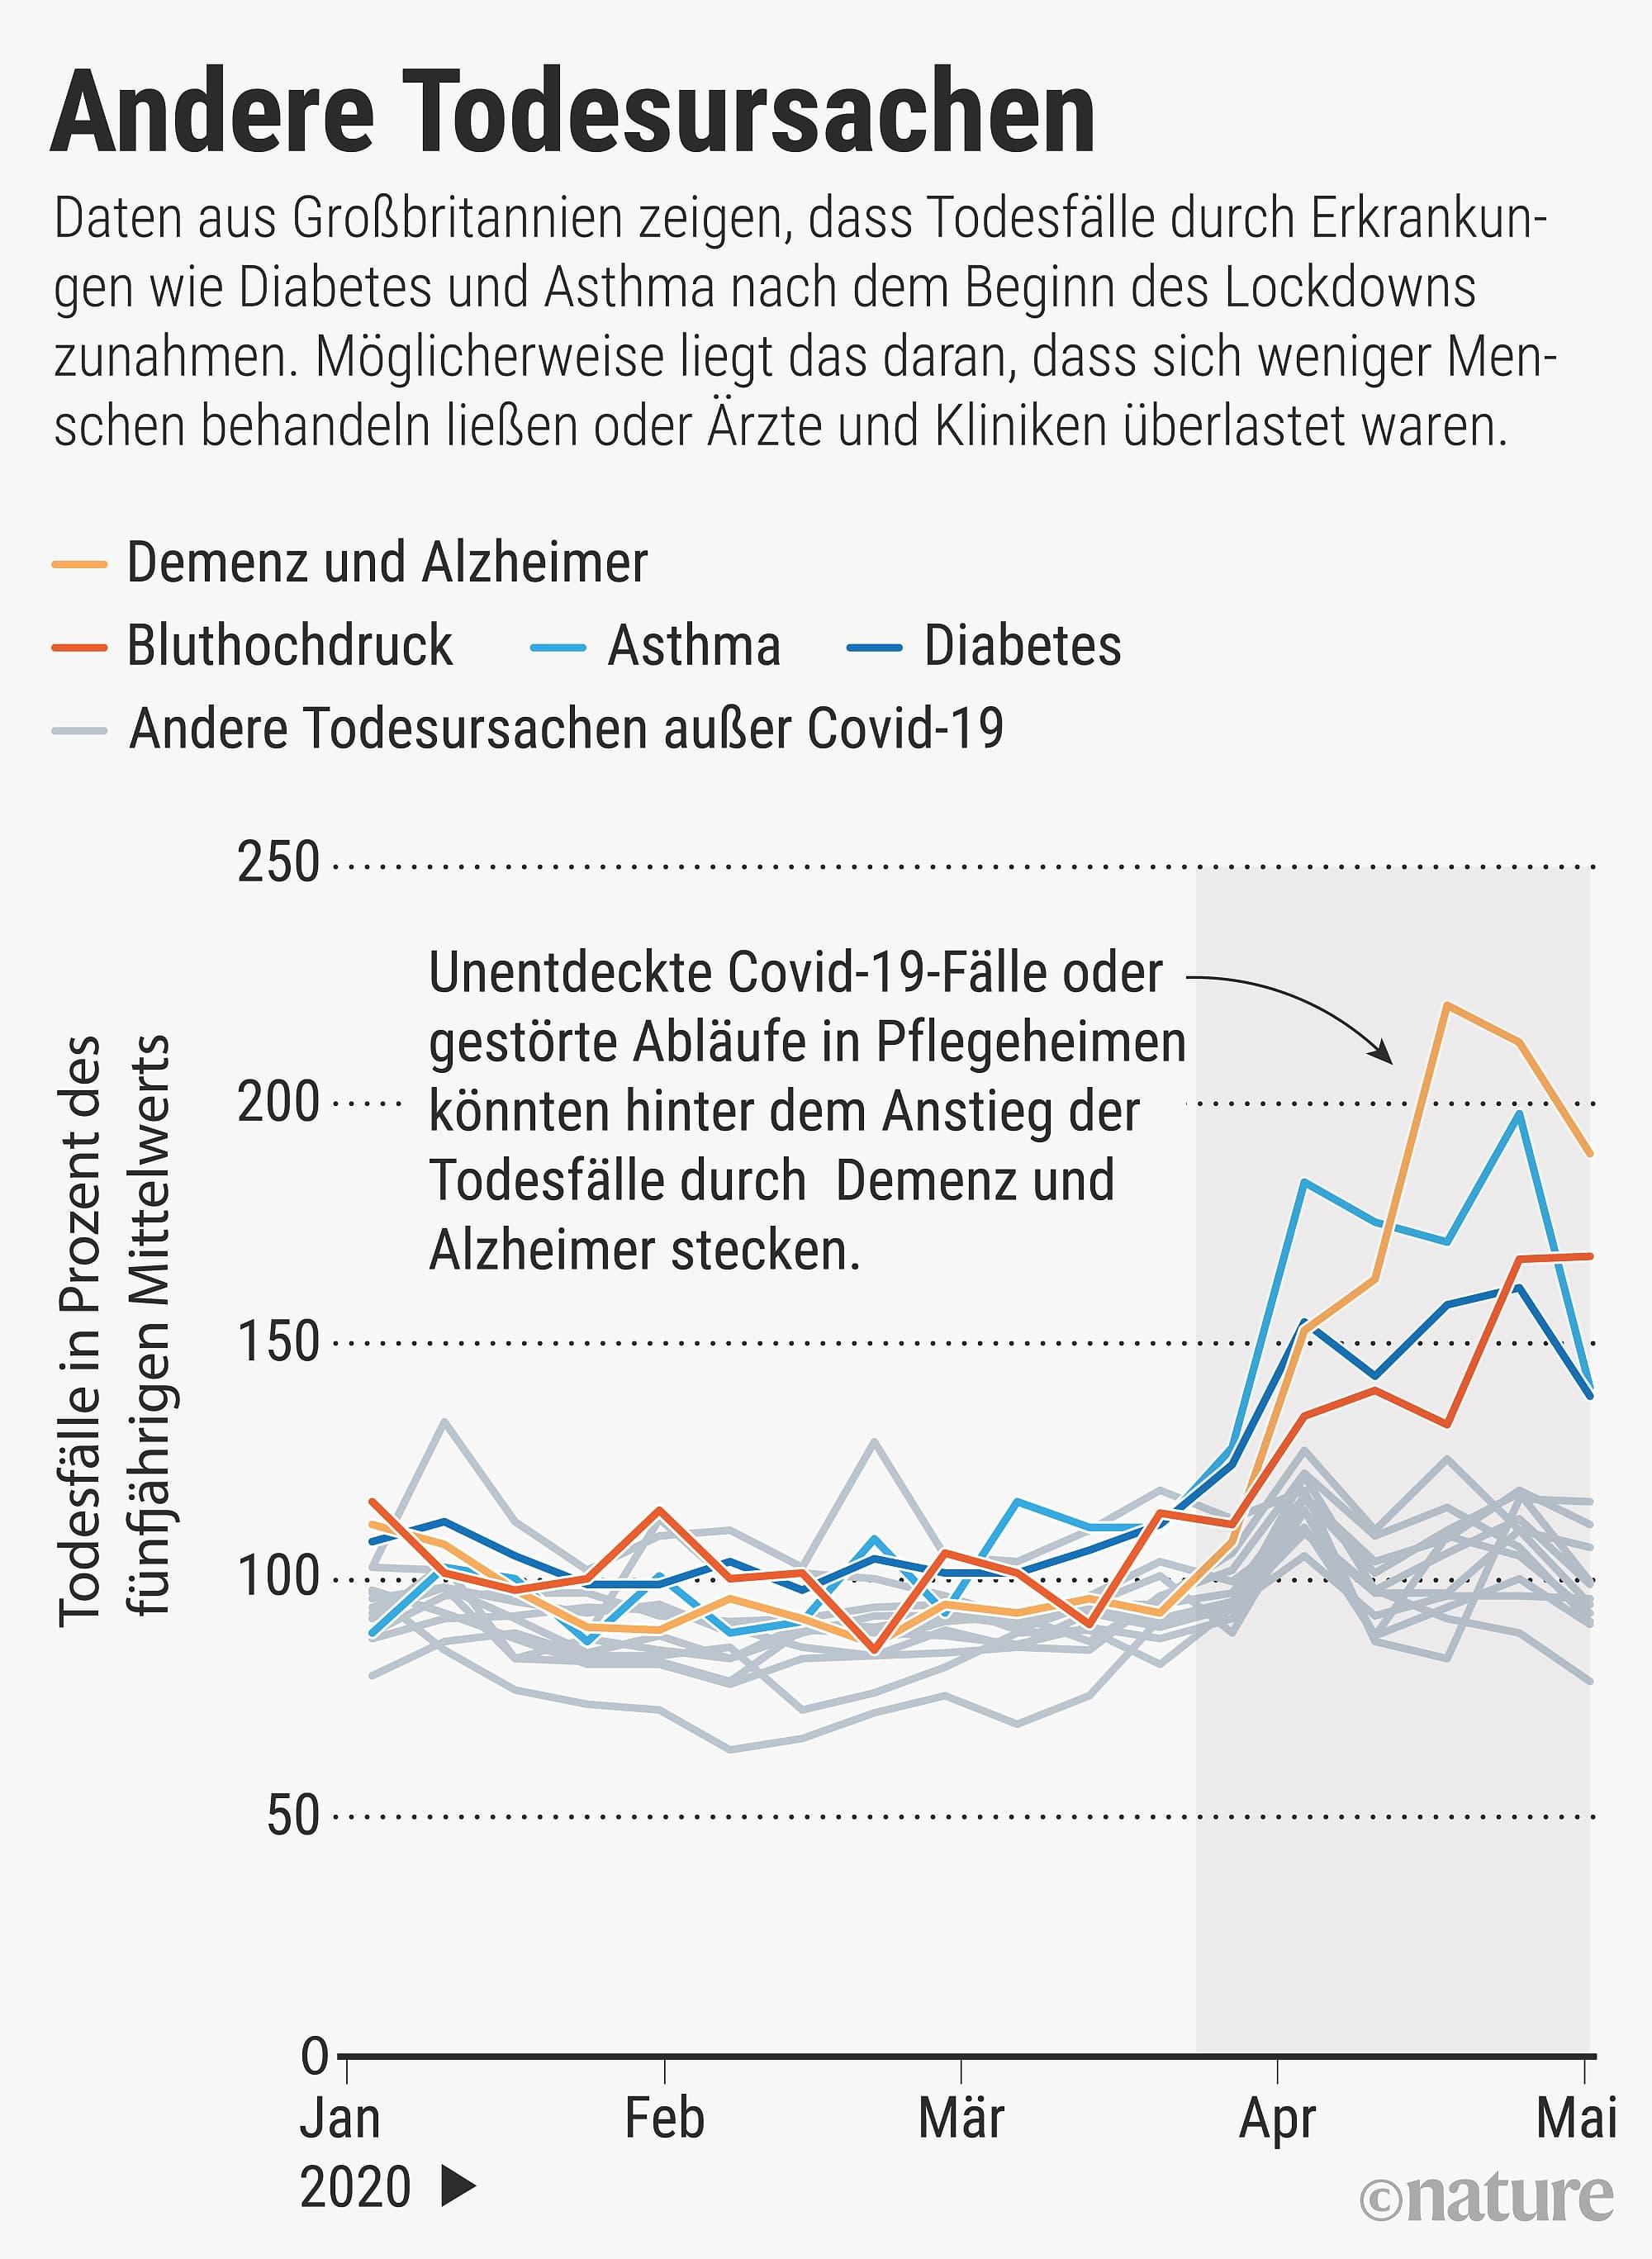 Grafik: Andere Todesursachen